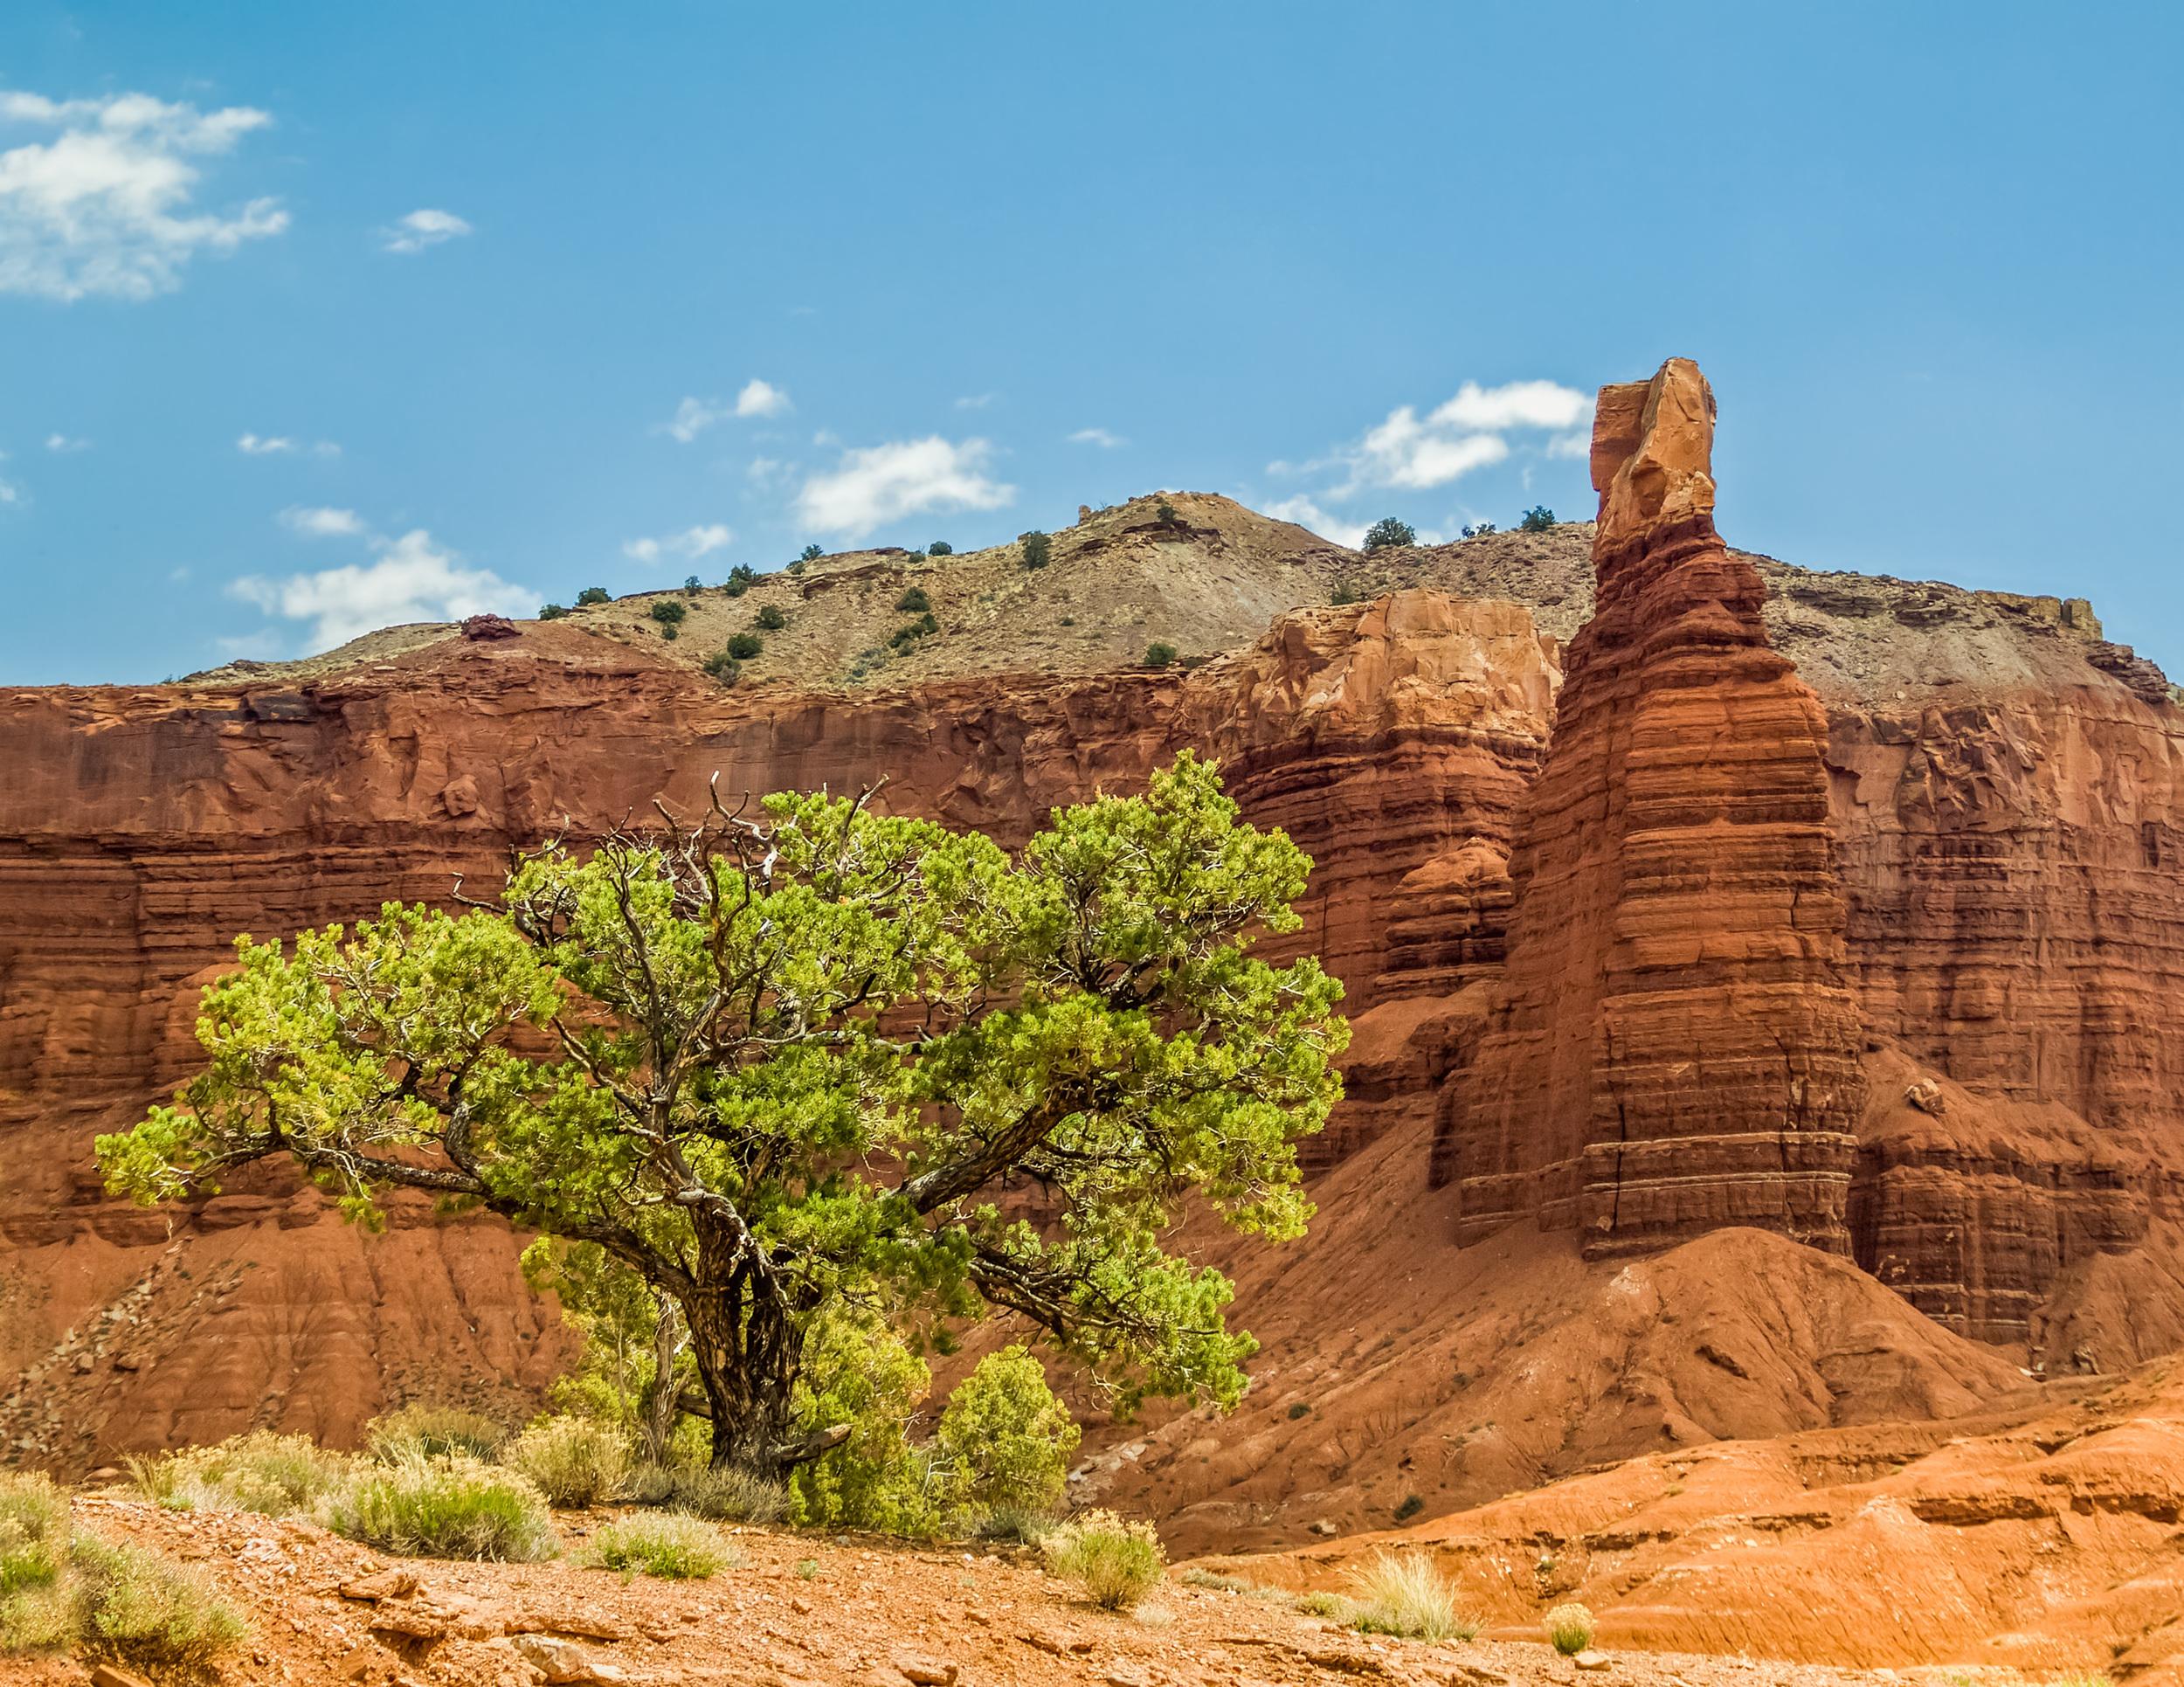 A TREE NEAR CHIMNEY ROCK